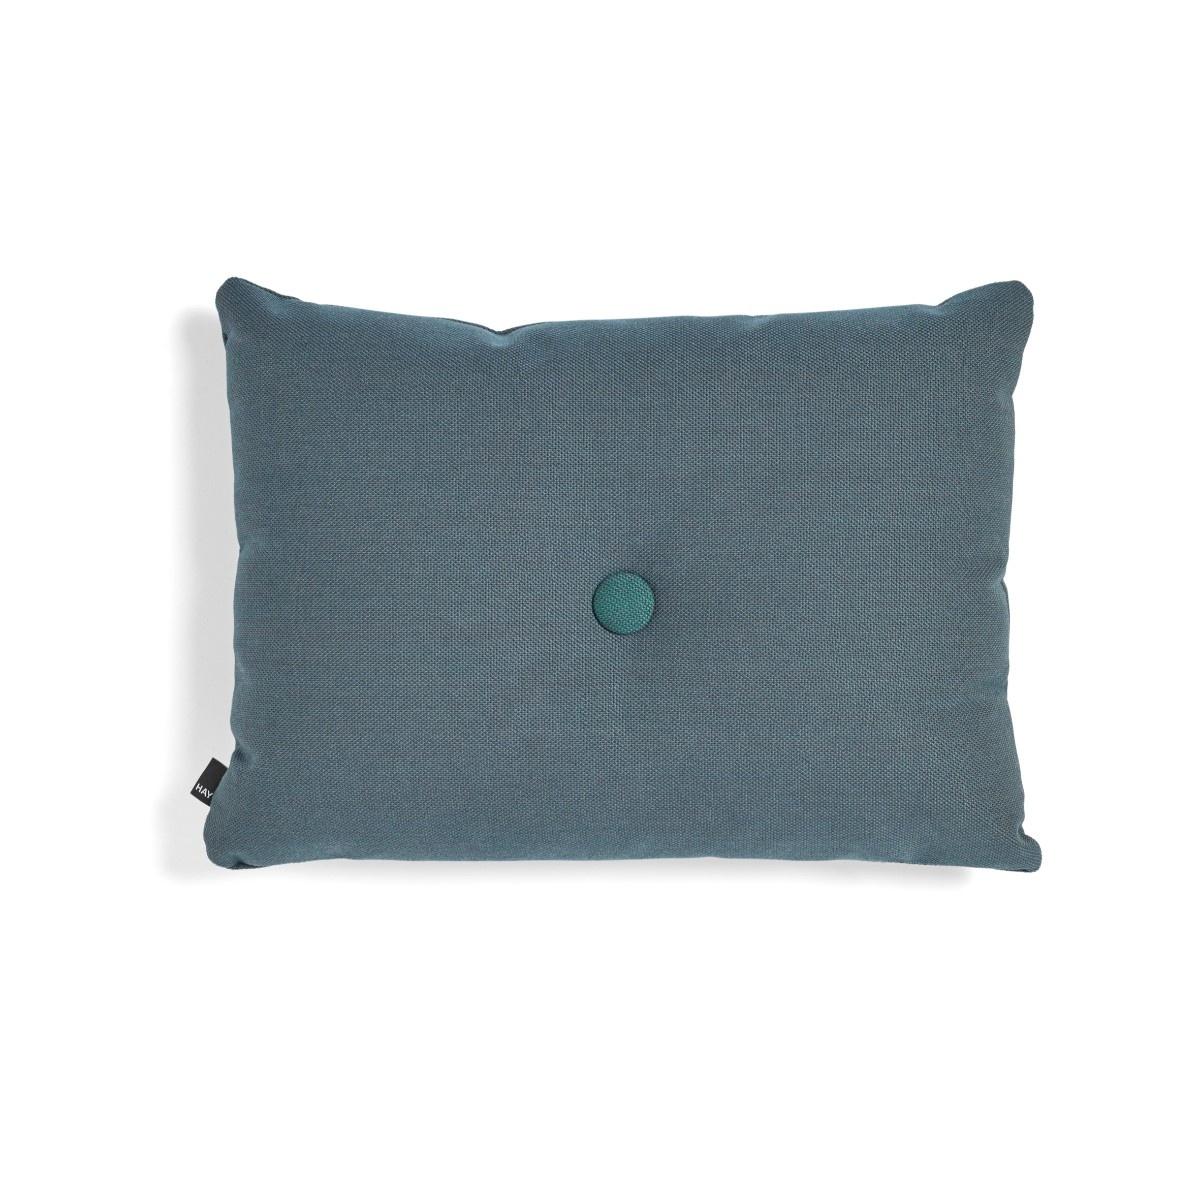 HAY Dot Cushion Steelcut pyntepude, 45x60 cm, racing green